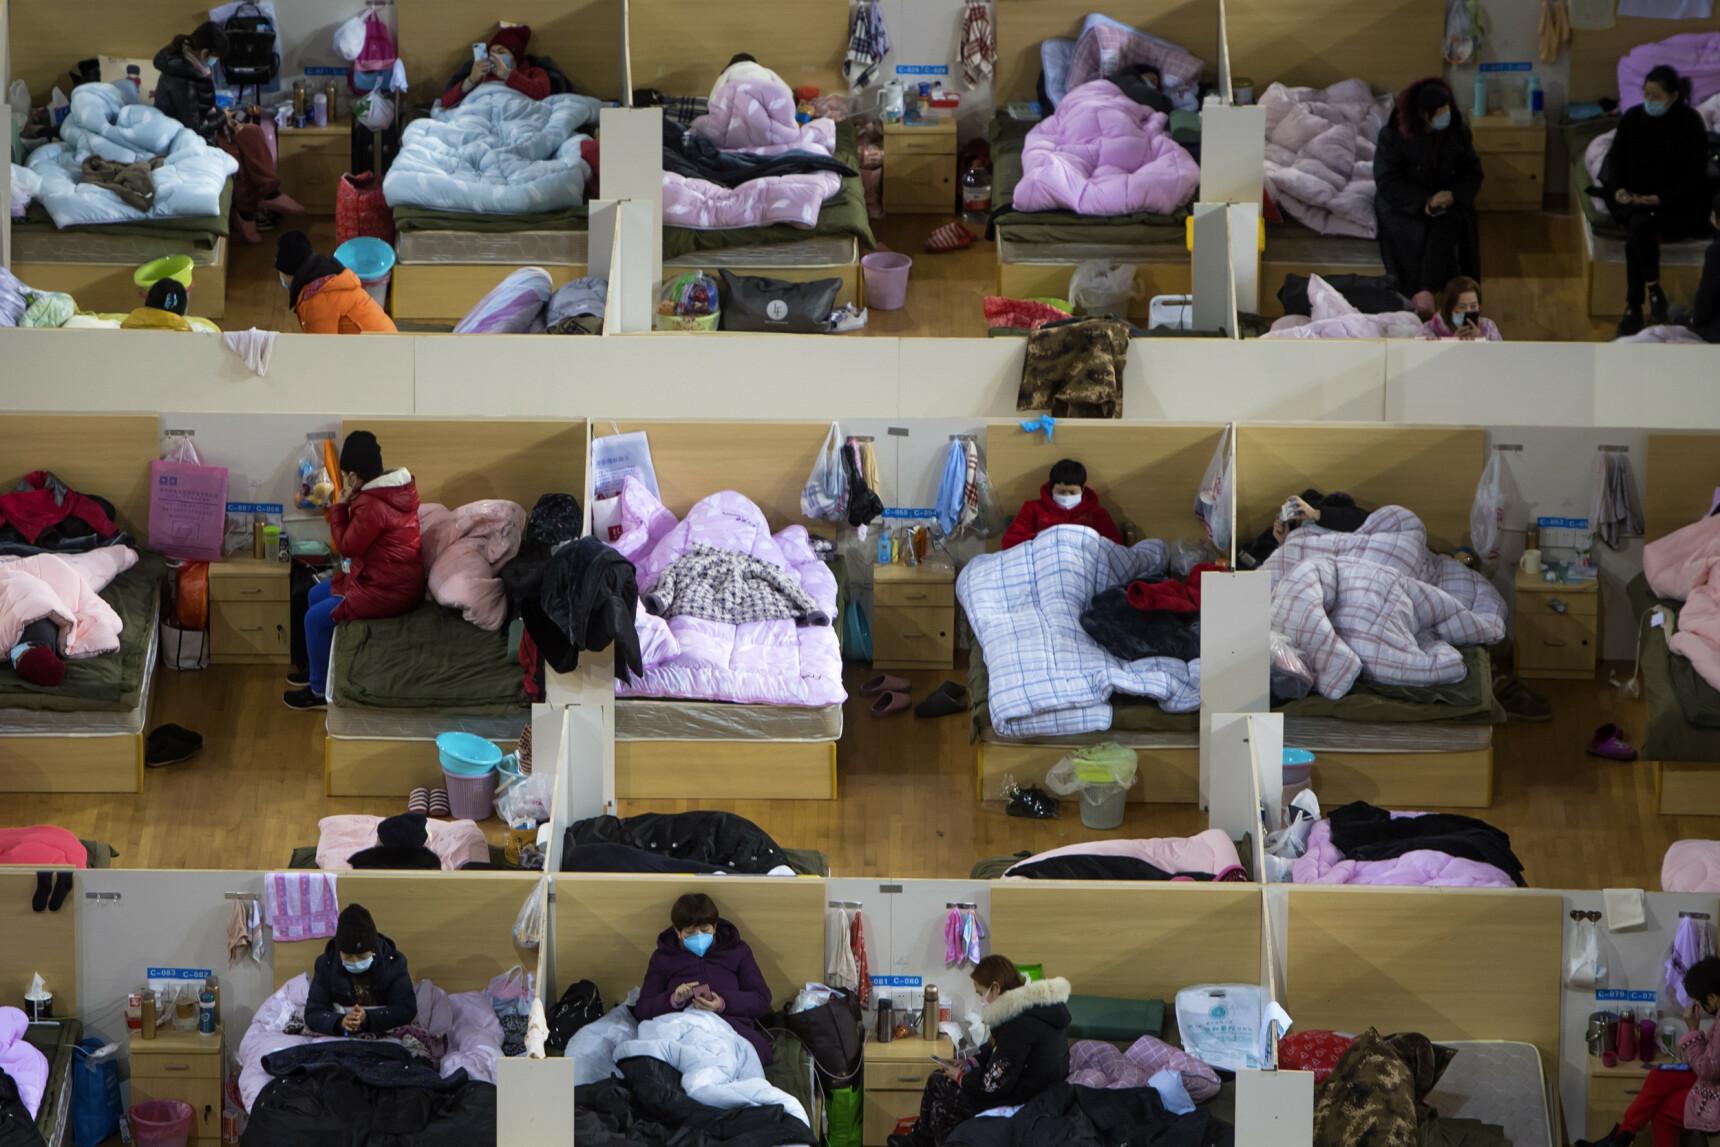 SMITTEDE: Her venter coronasmittede pasienter i et midlertidig sykehus i Wuhan Sport Center. Foto:Xiao Yijiu/AP/NTB